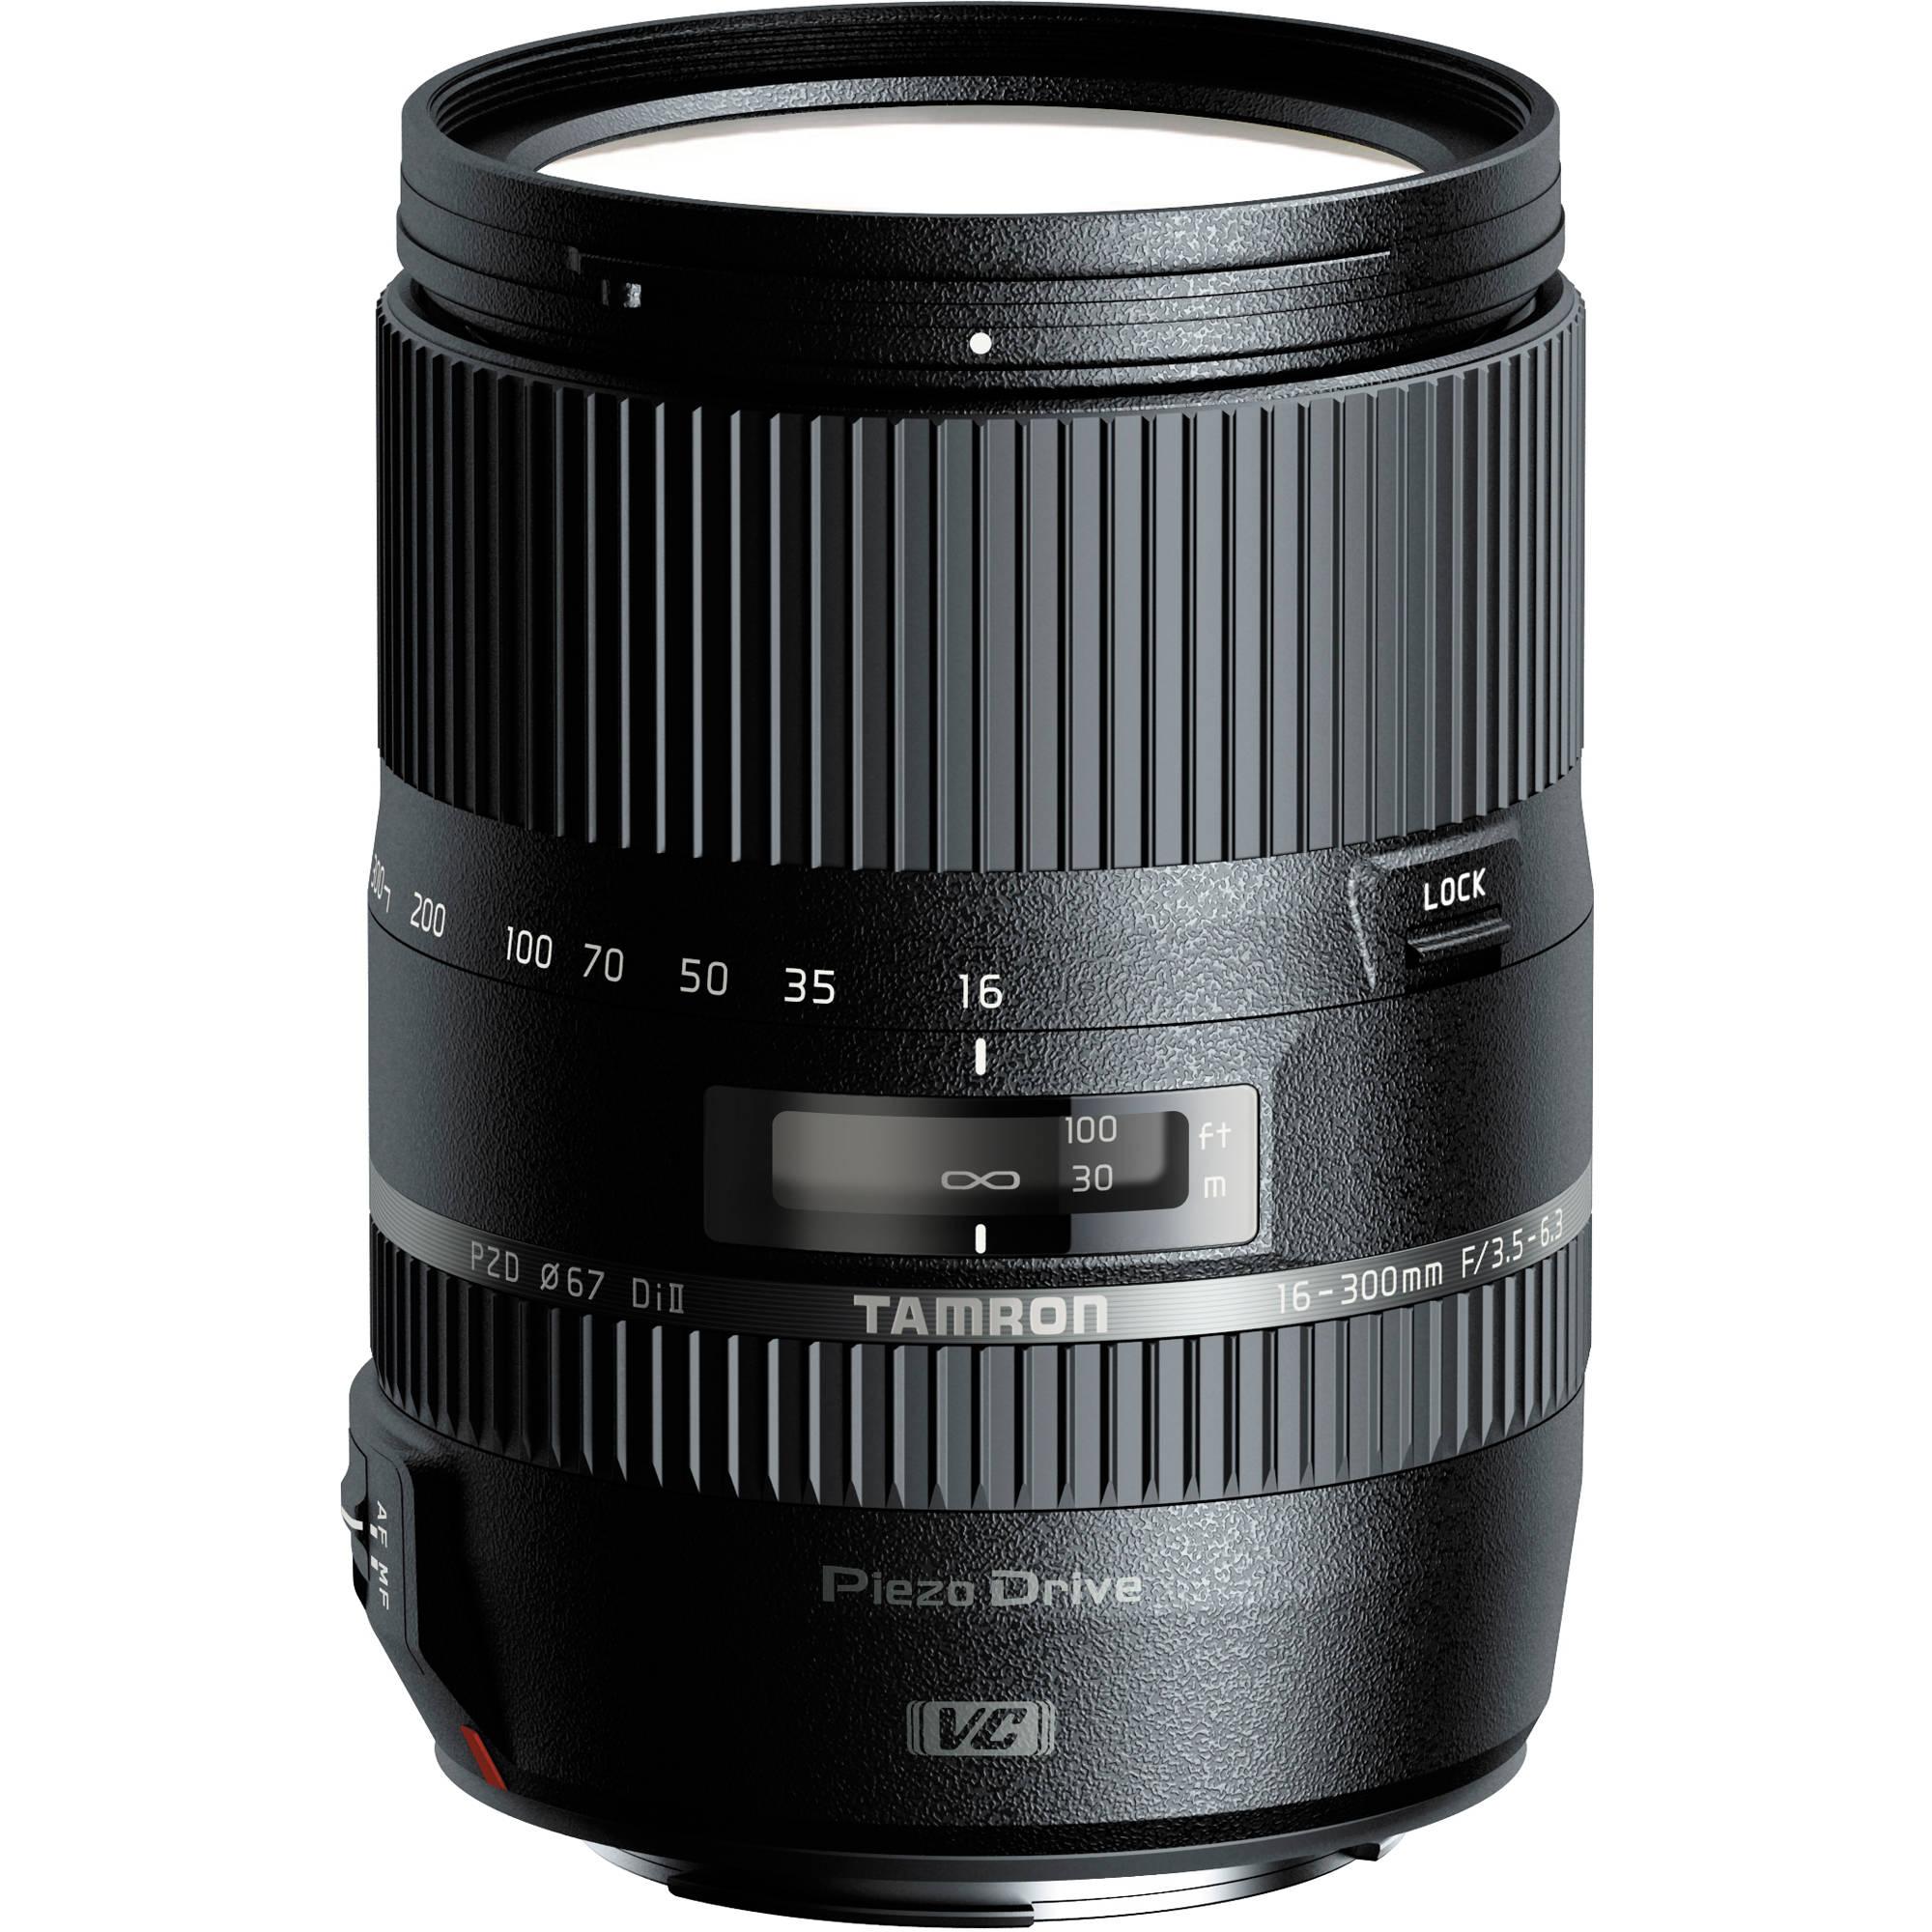 tamron 16 300mm f 3 5 6 3 di ii vc pzd macro lens afb016c 700. Black Bedroom Furniture Sets. Home Design Ideas